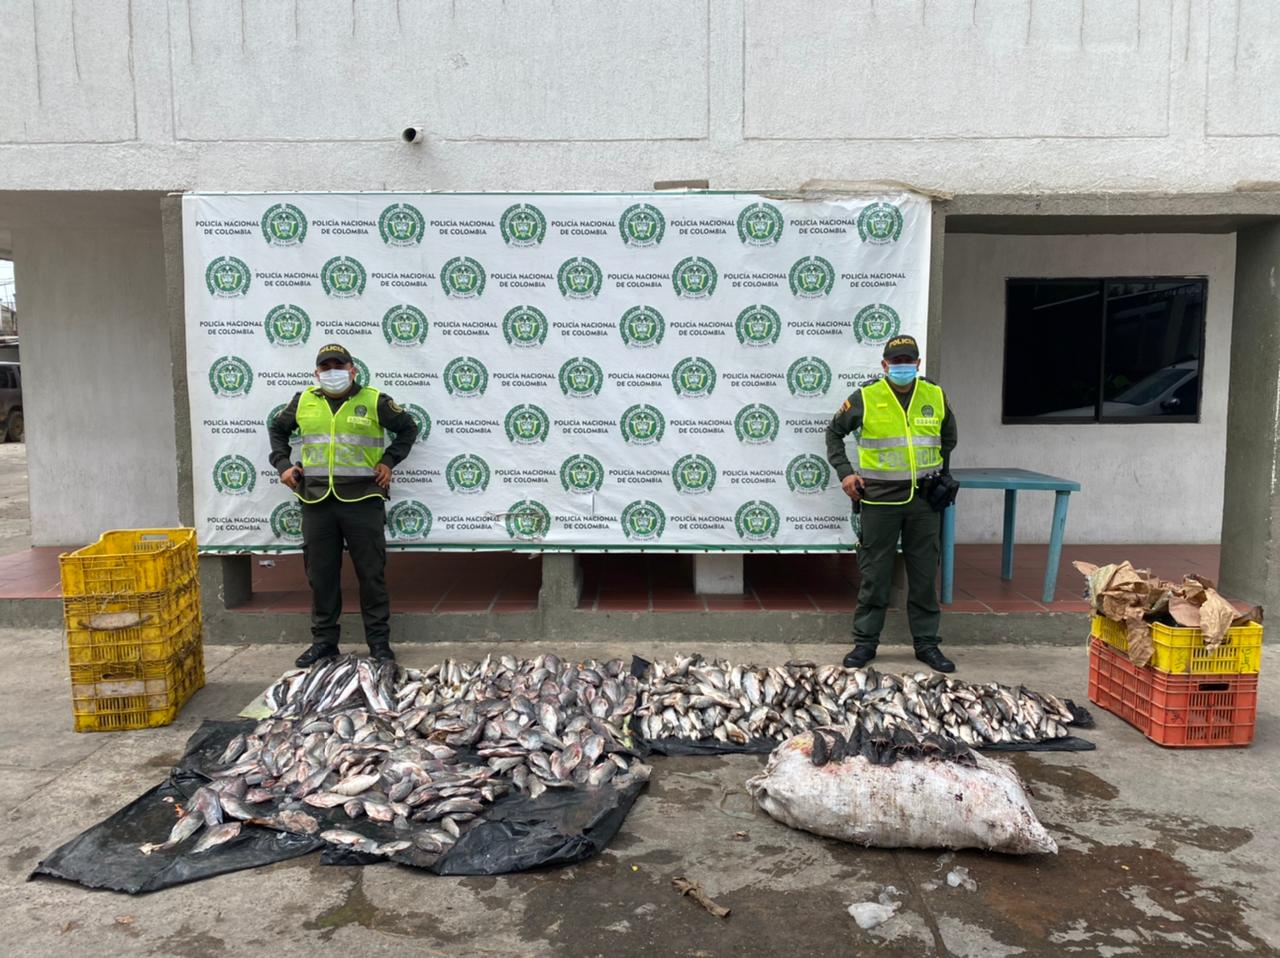 hoyennoticia.com, 80 kilos de pescados incautaron en Maicao